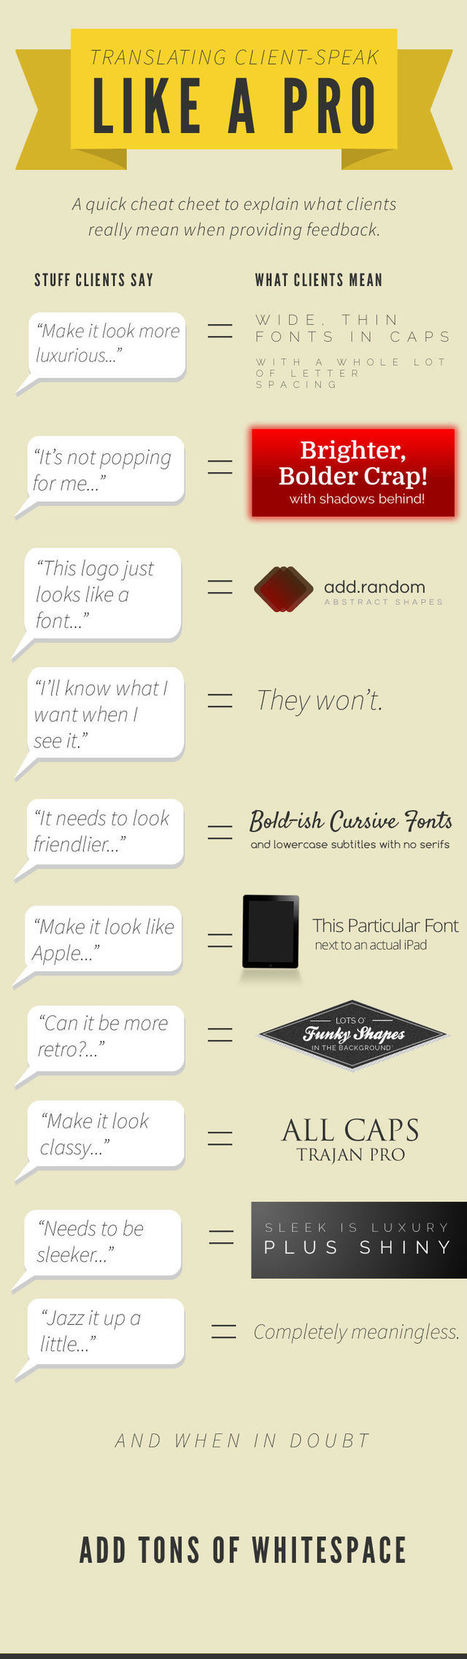 Graphic Designer - How they interpret Clients?   Desktop Publishing and Graphics Design   Scoop.it